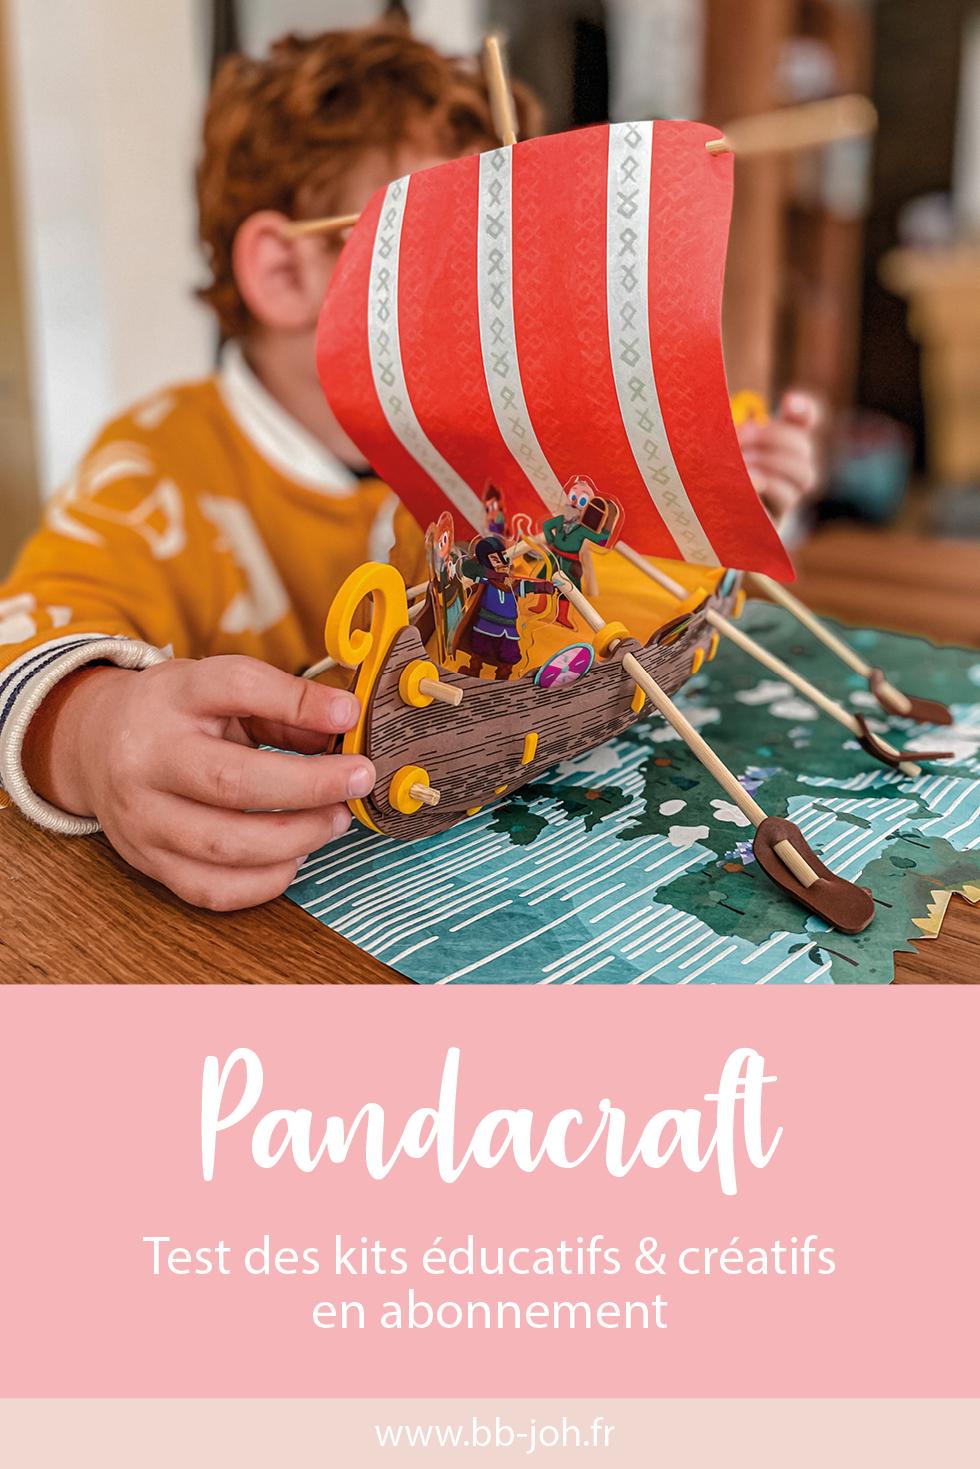 Avis test code promo pandacraft